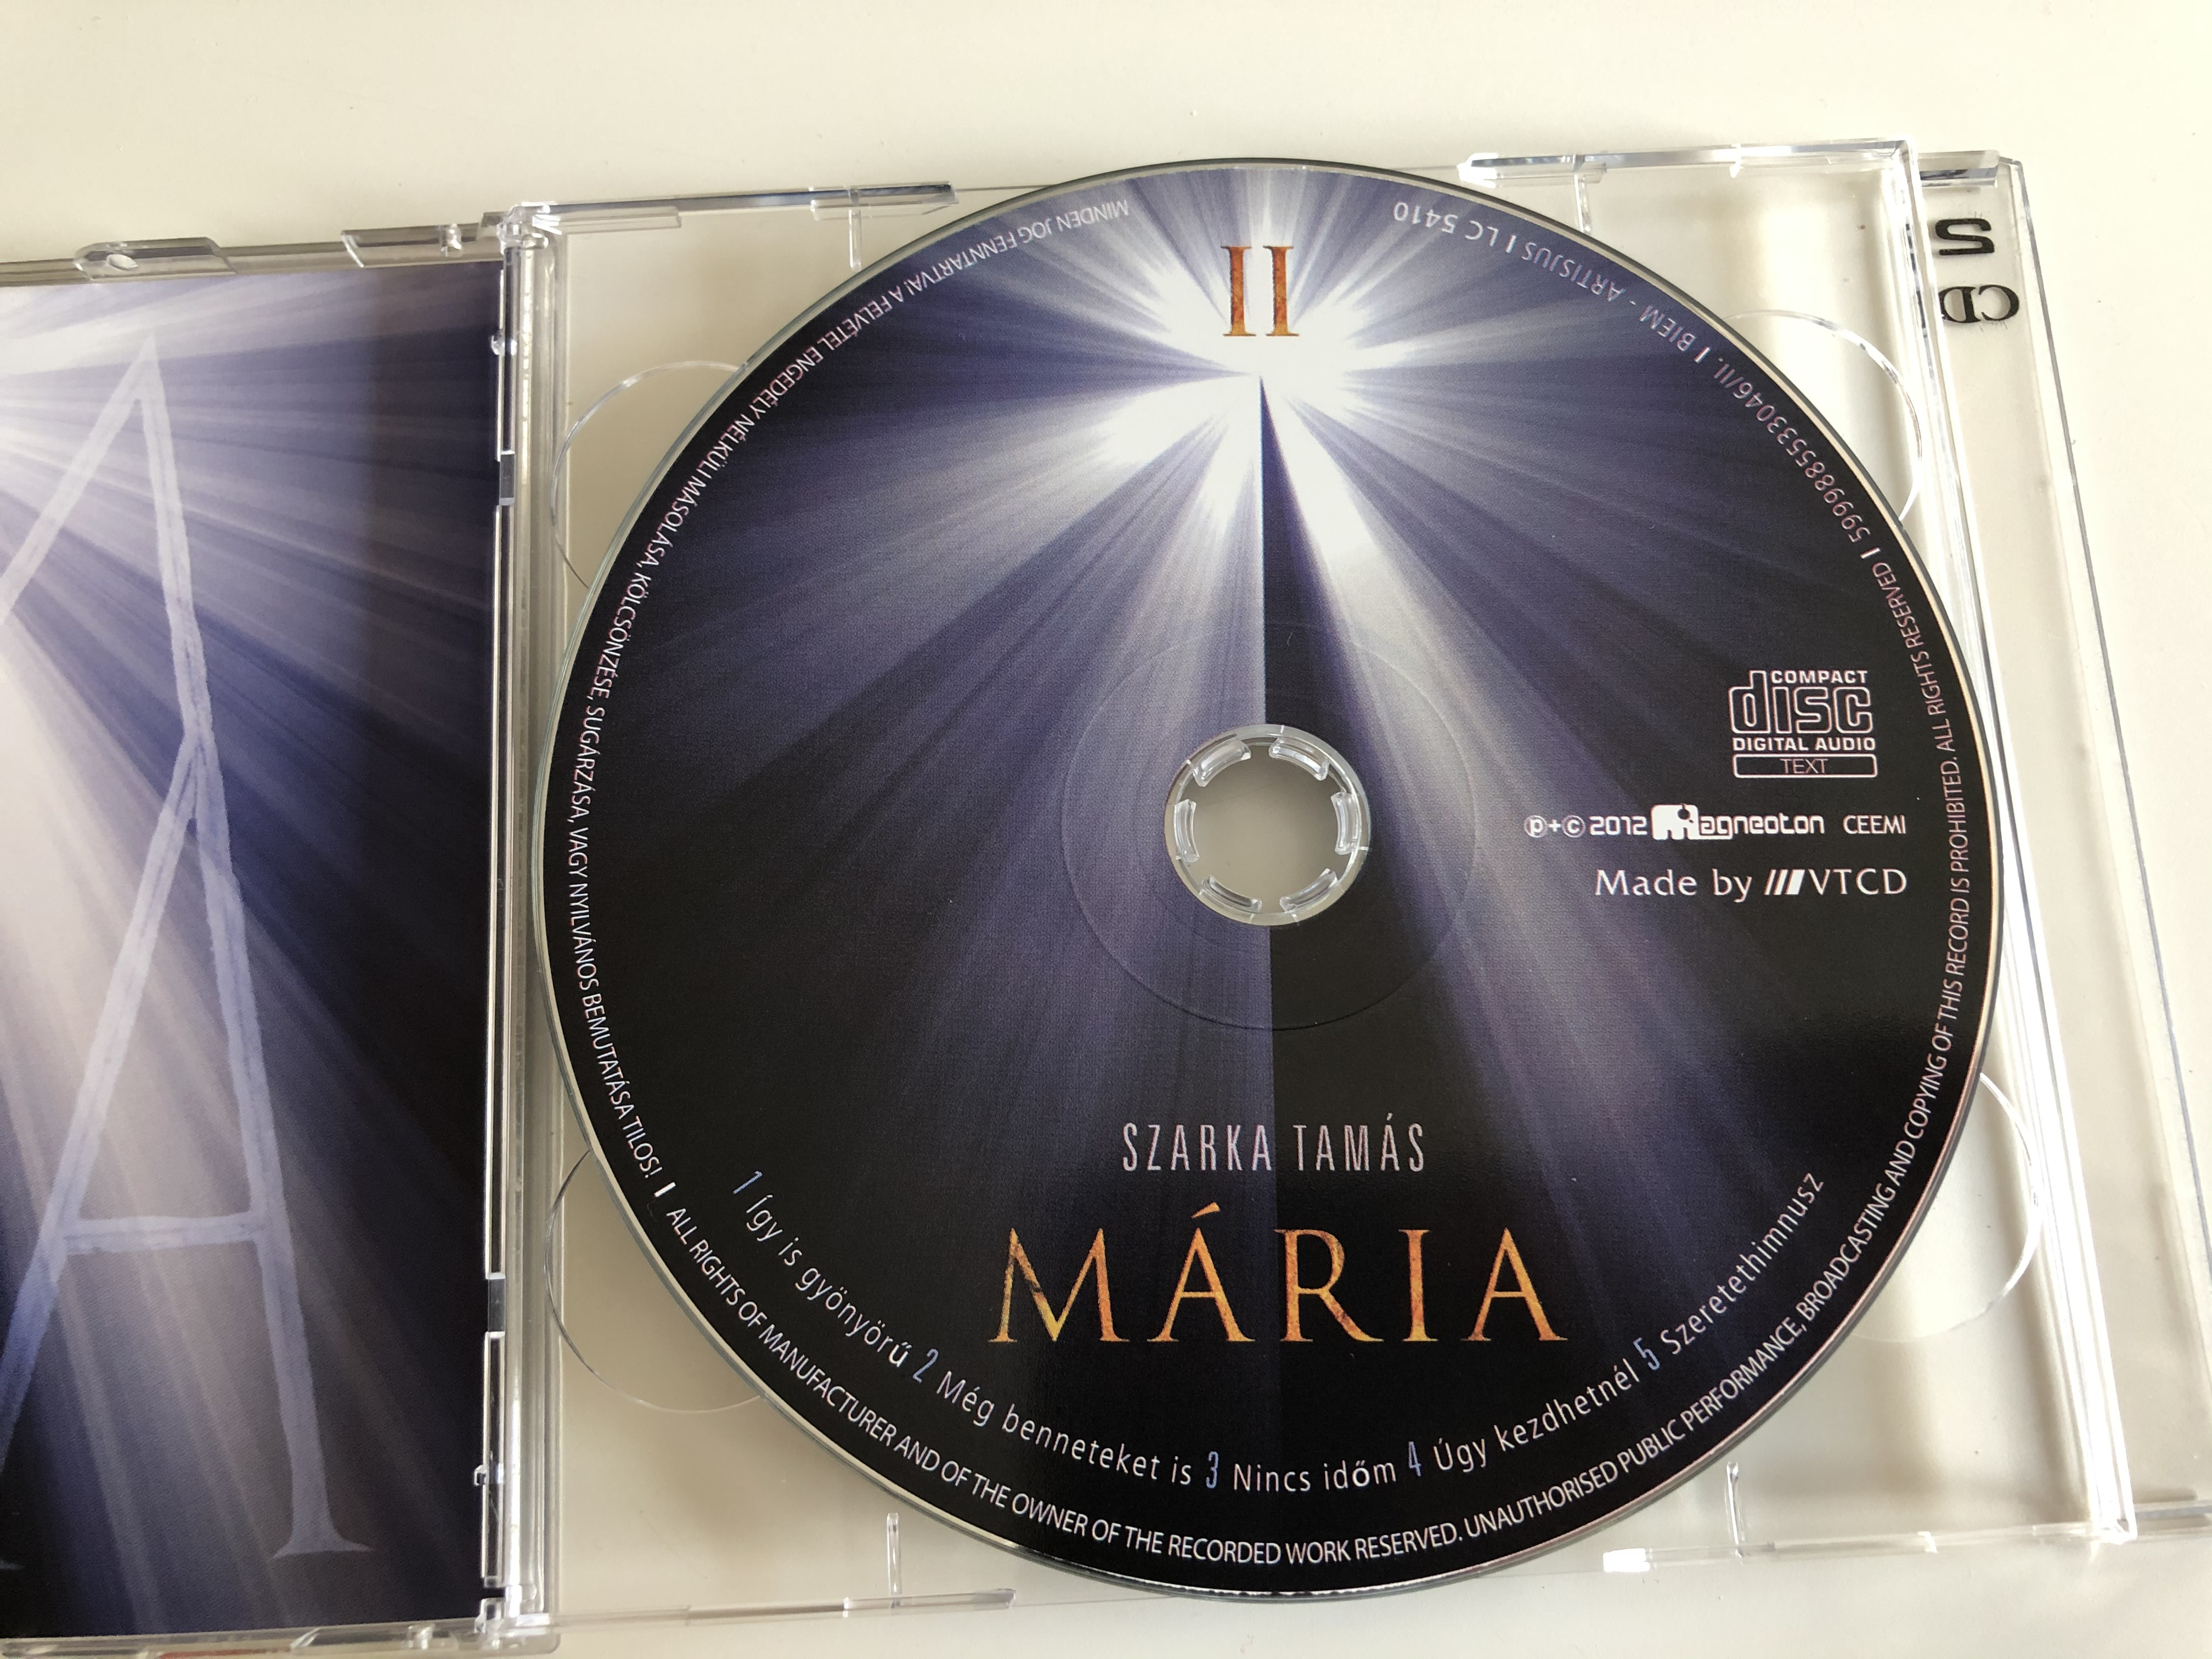 szarka-tamas-maria-musical-magneoton-2x-audio-cd-2012-5999885533046-4-.jpg